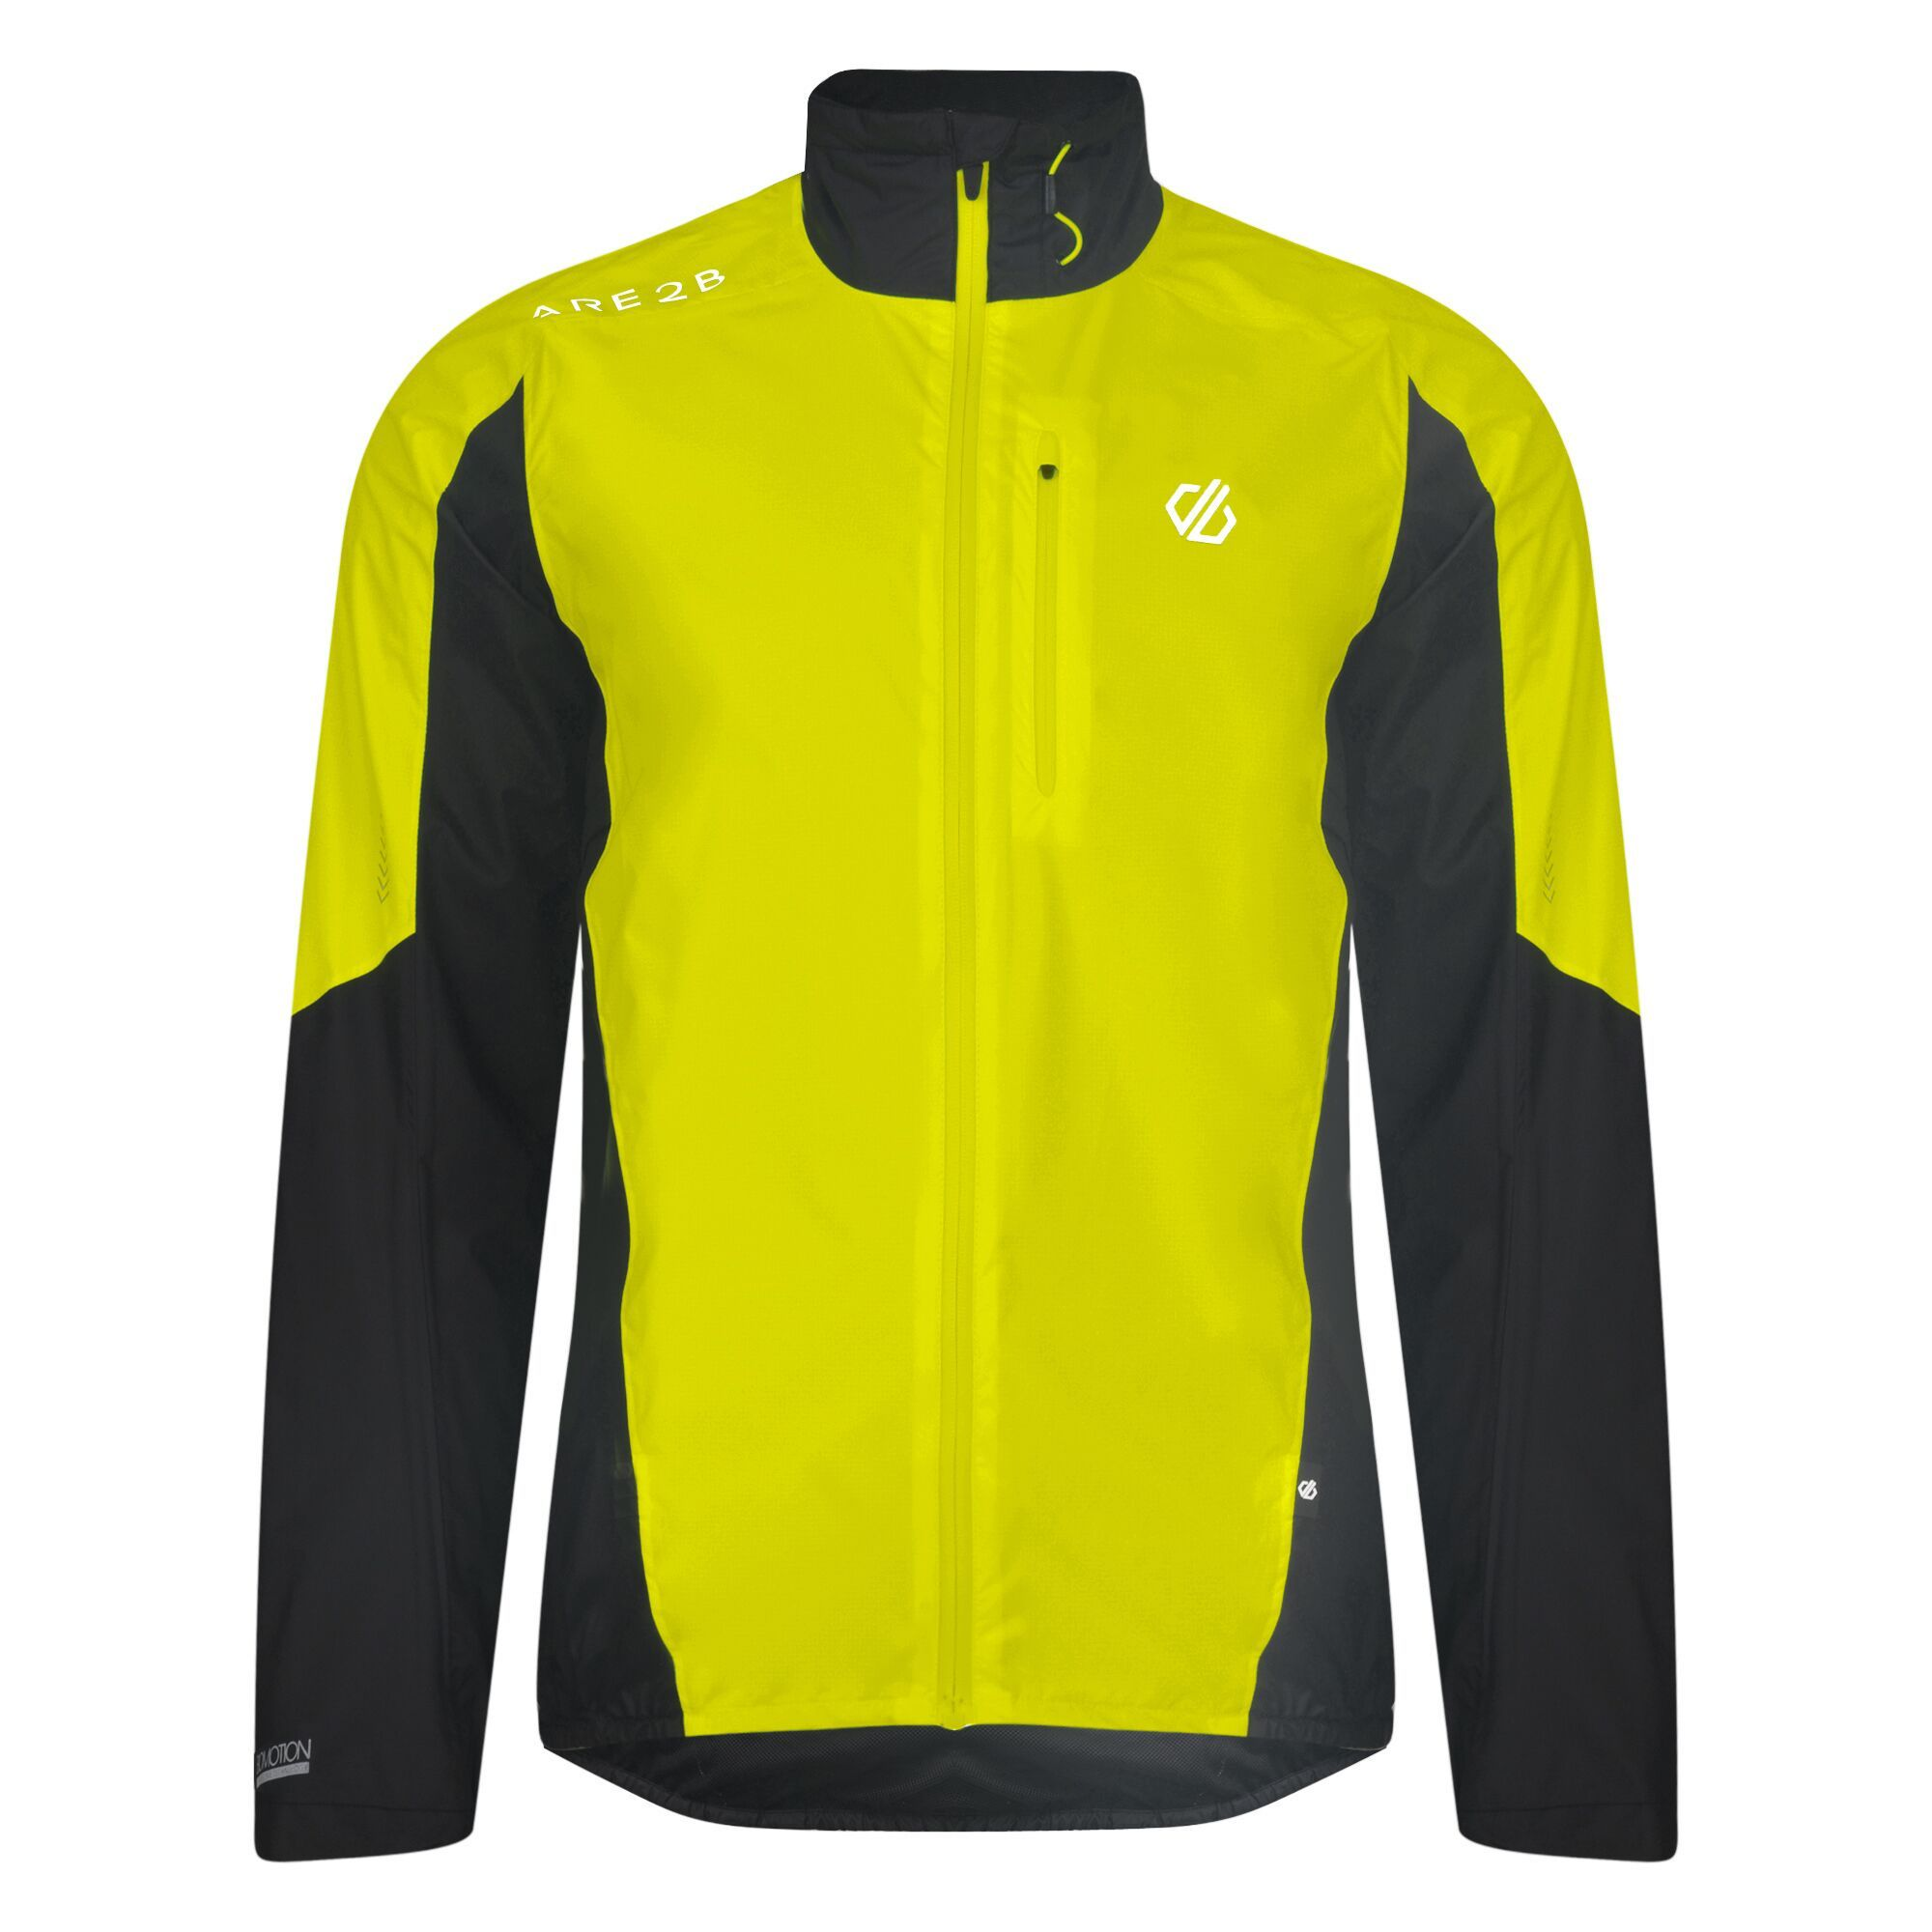 Yellow reflective running jacket